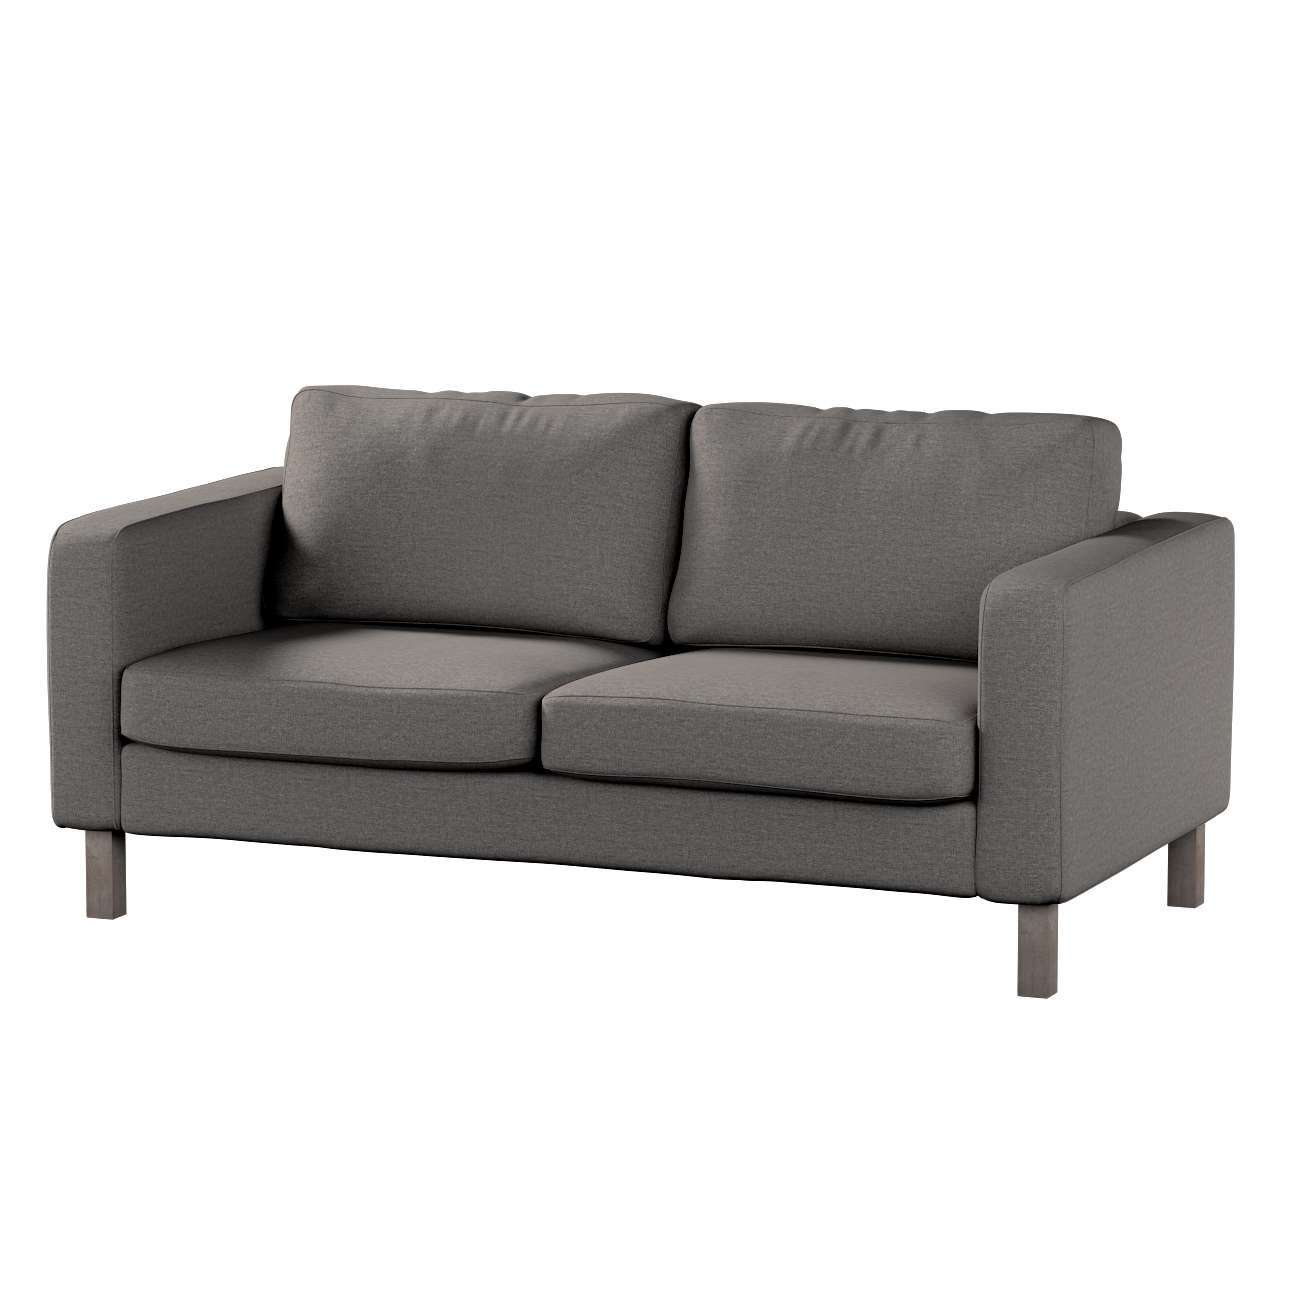 KARSLTAD dvivietės sofos užvalkalas Karlstad 2-vietės sofos užvalkalas kolekcijoje Edinburgh , audinys: 115-77